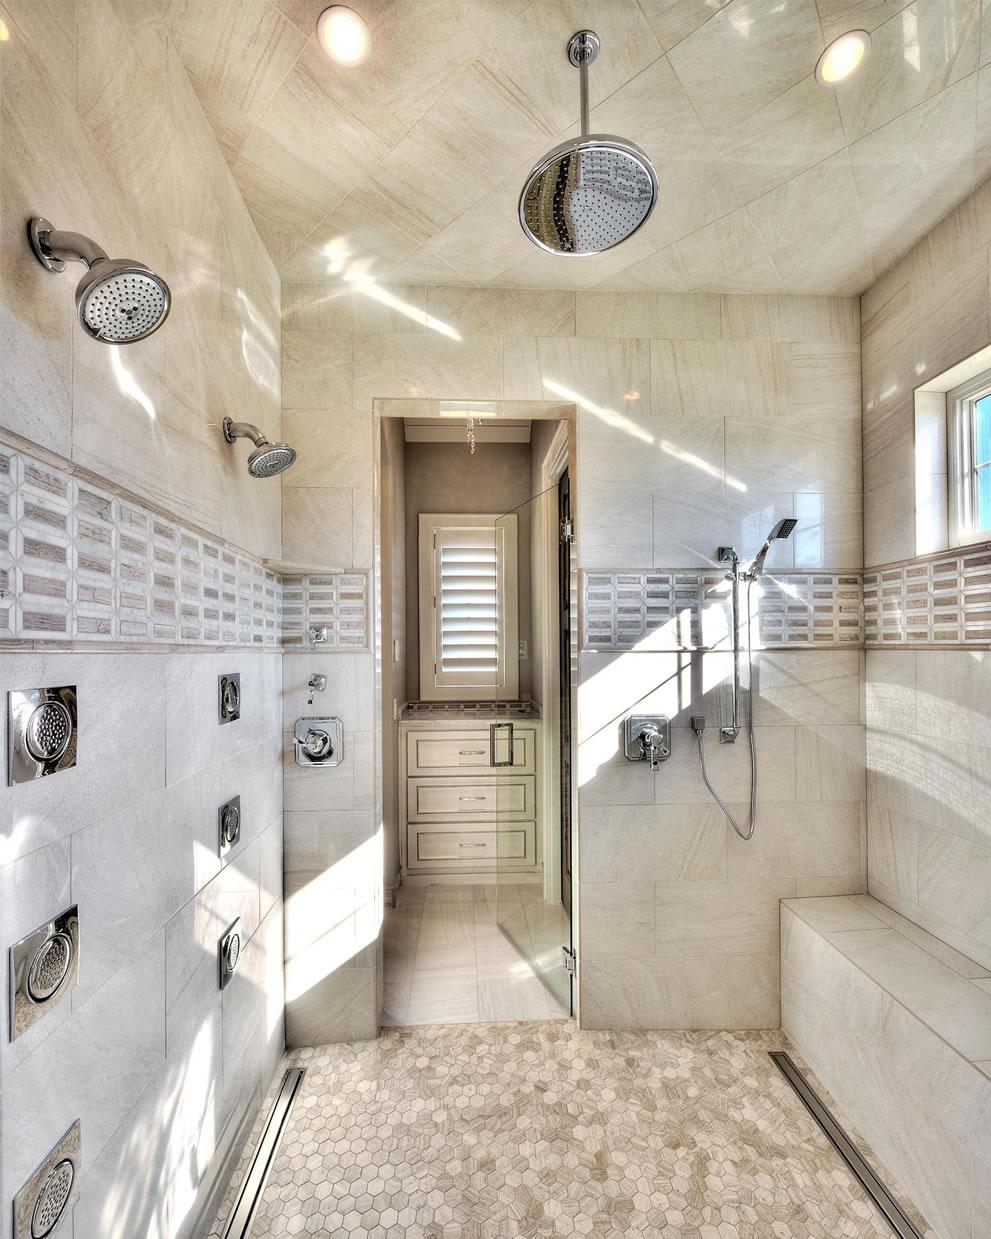 5 walkin shower designs you should consider  unique